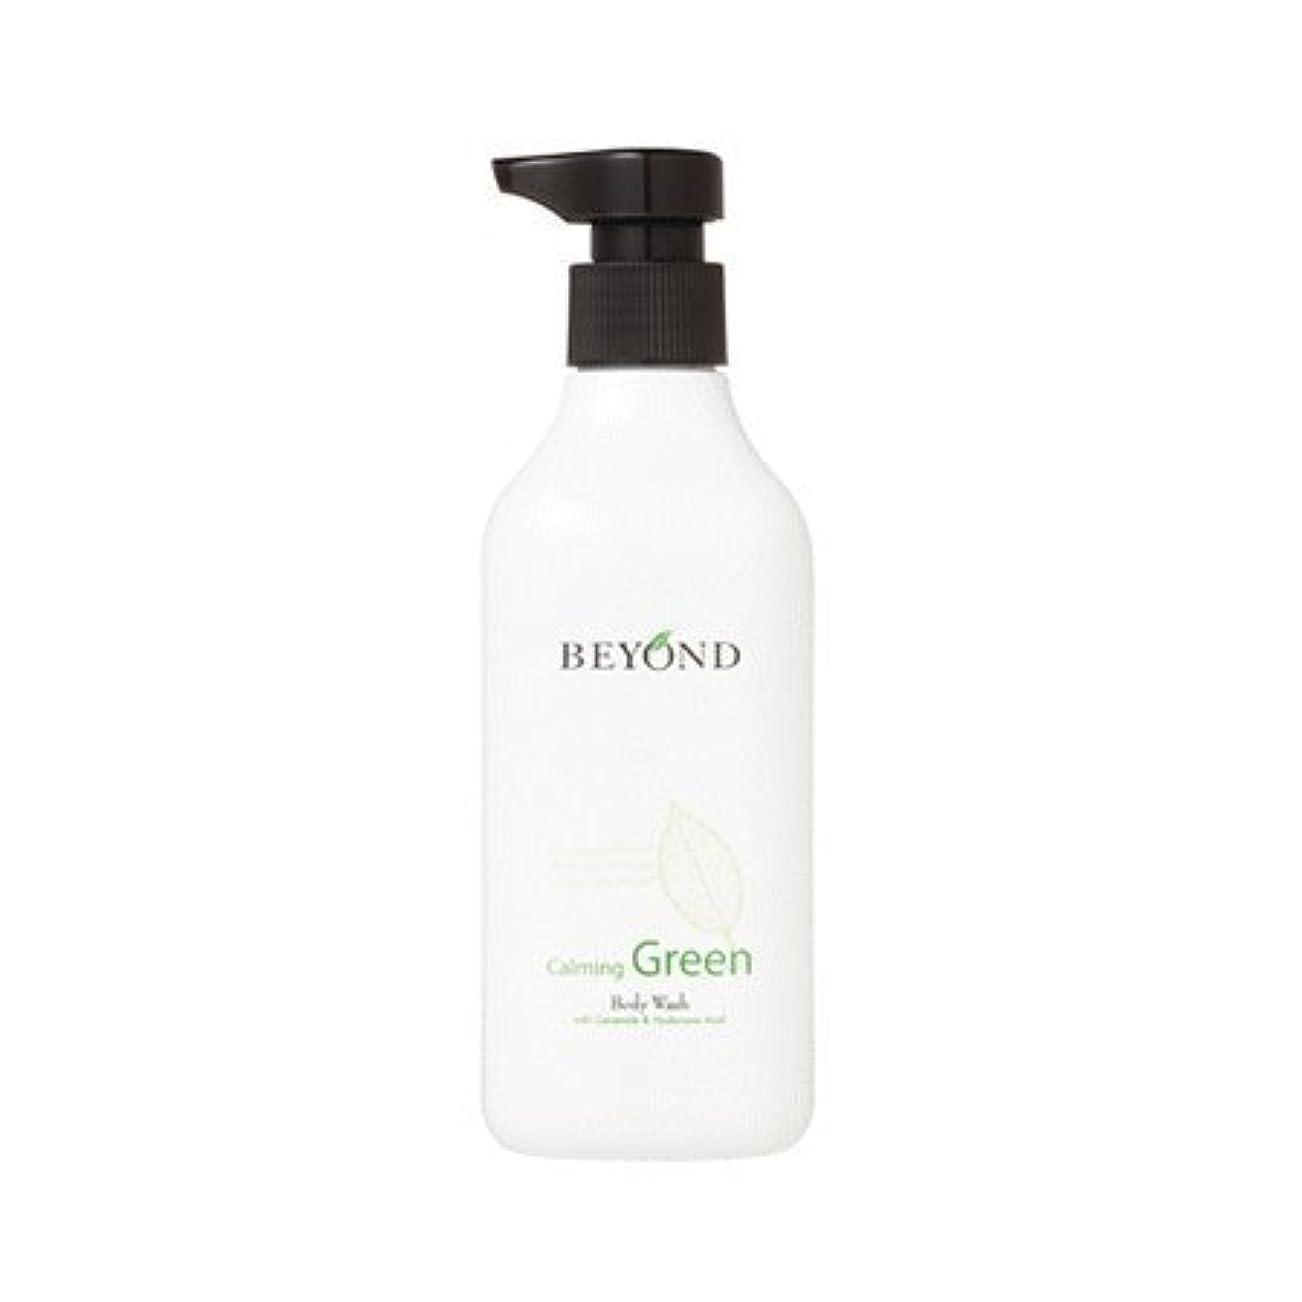 Beyond calming green body wash 300ml